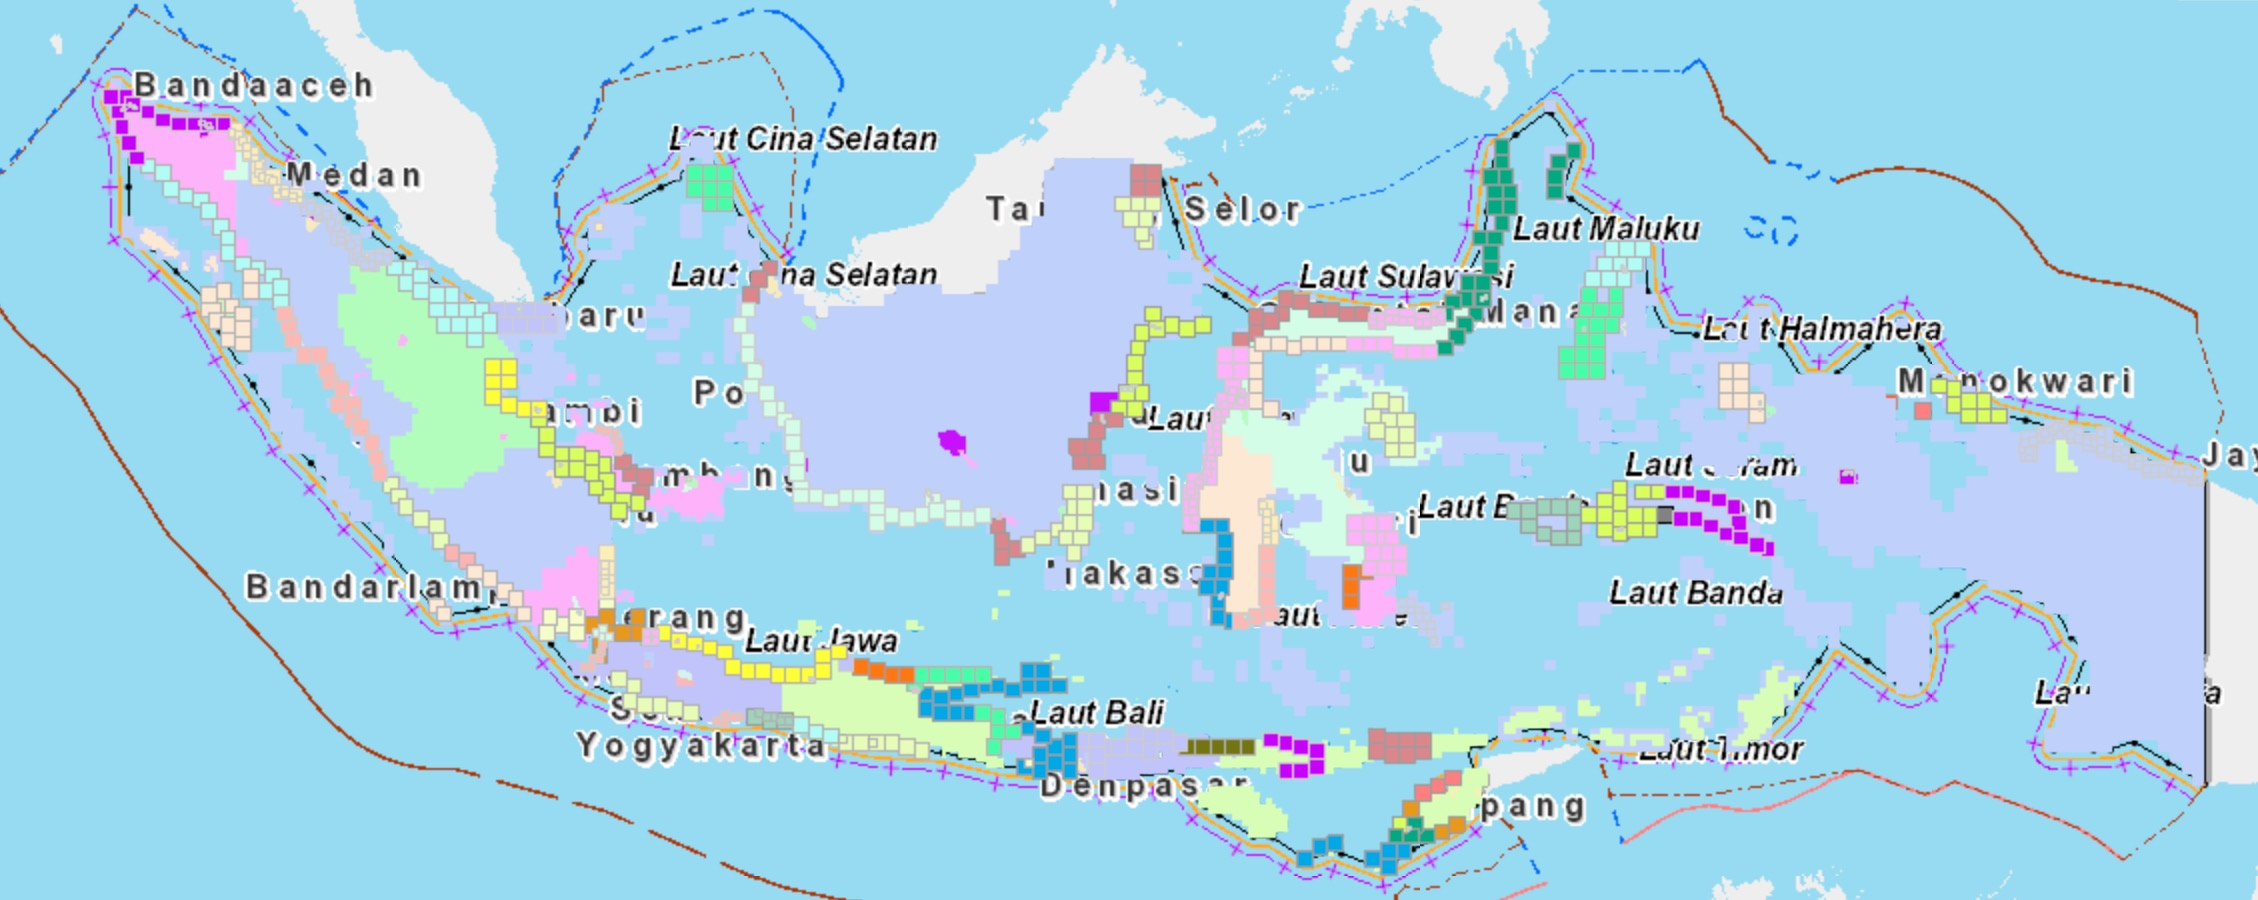 Indonesia Geospatial Portal